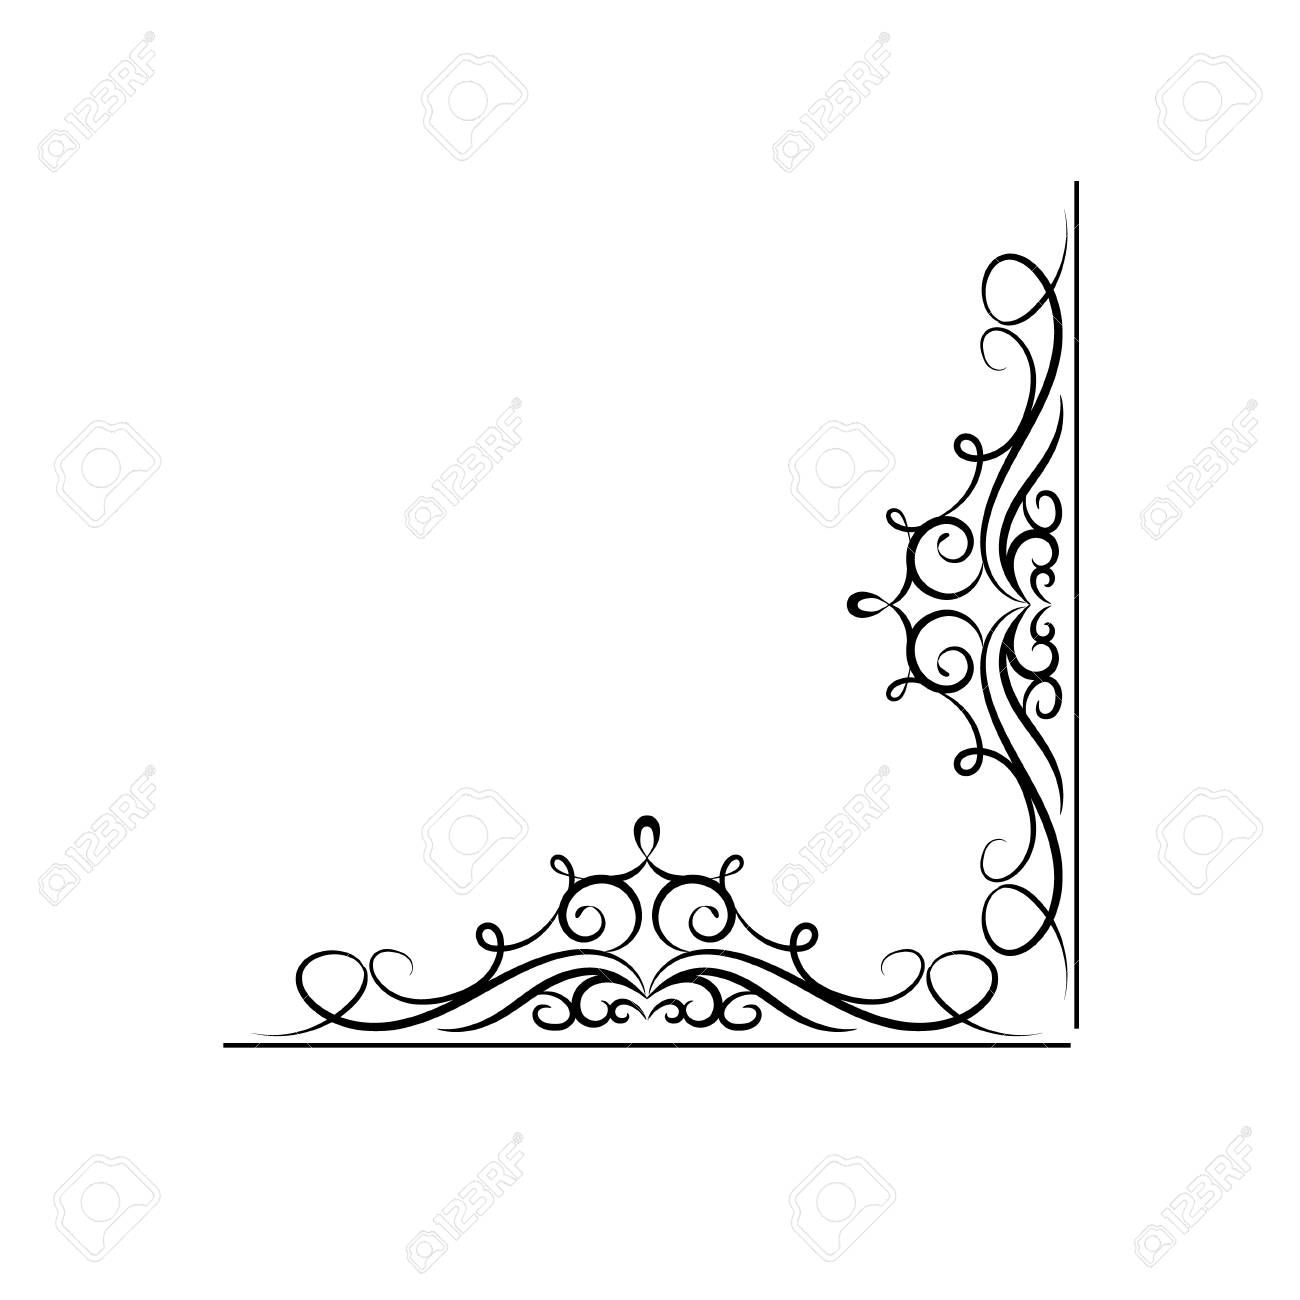 Vintage Vector Swirl Corner On White Background Illustration Ad Swirl Vector Vintage Corner Illustratio In 2020 Graphic Design Art Design Art Illustration